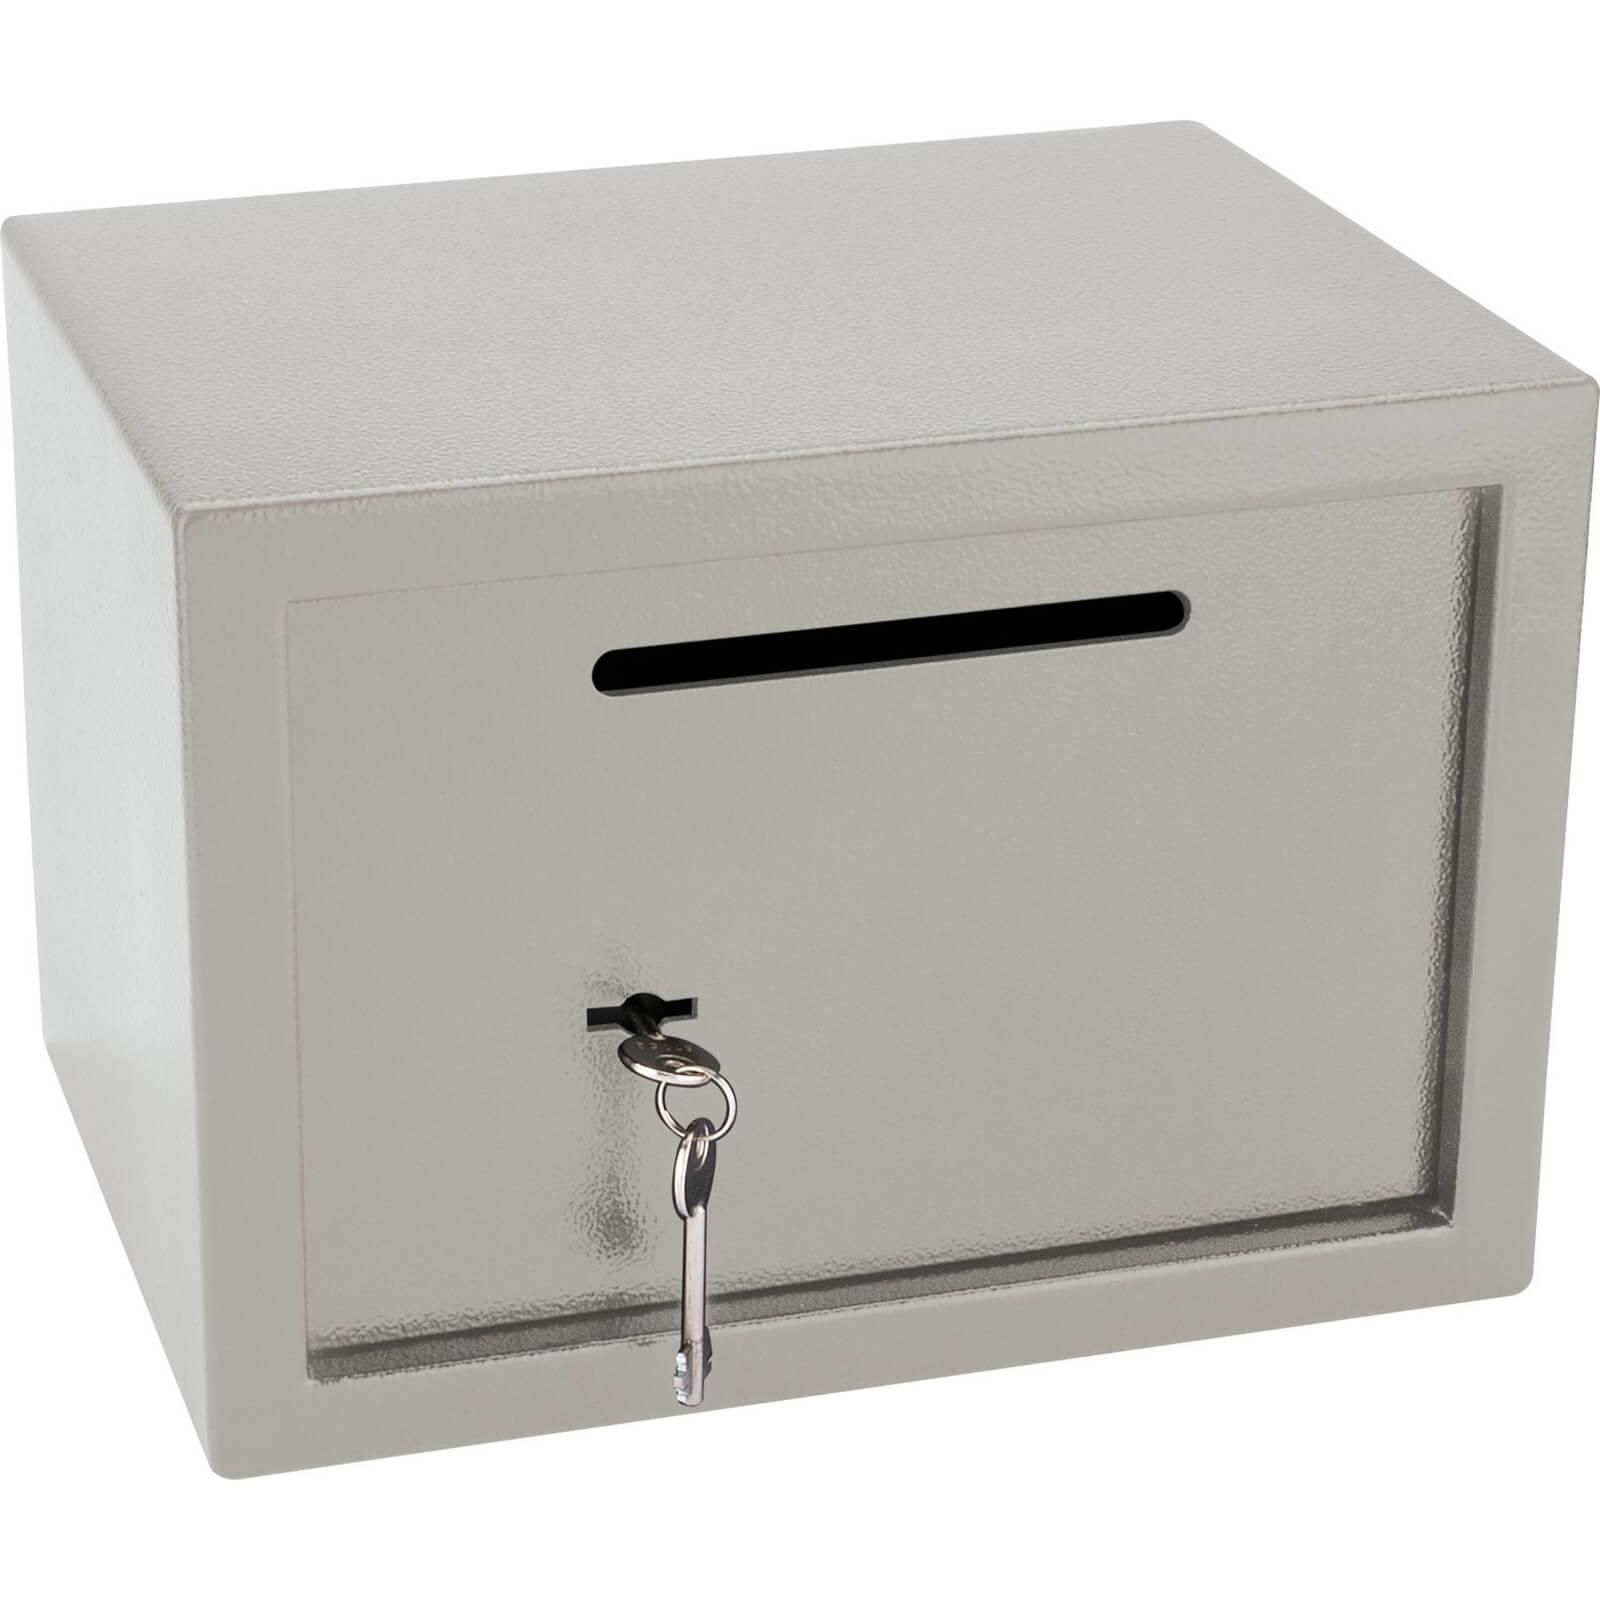 Image of Draper Key Lock Safe